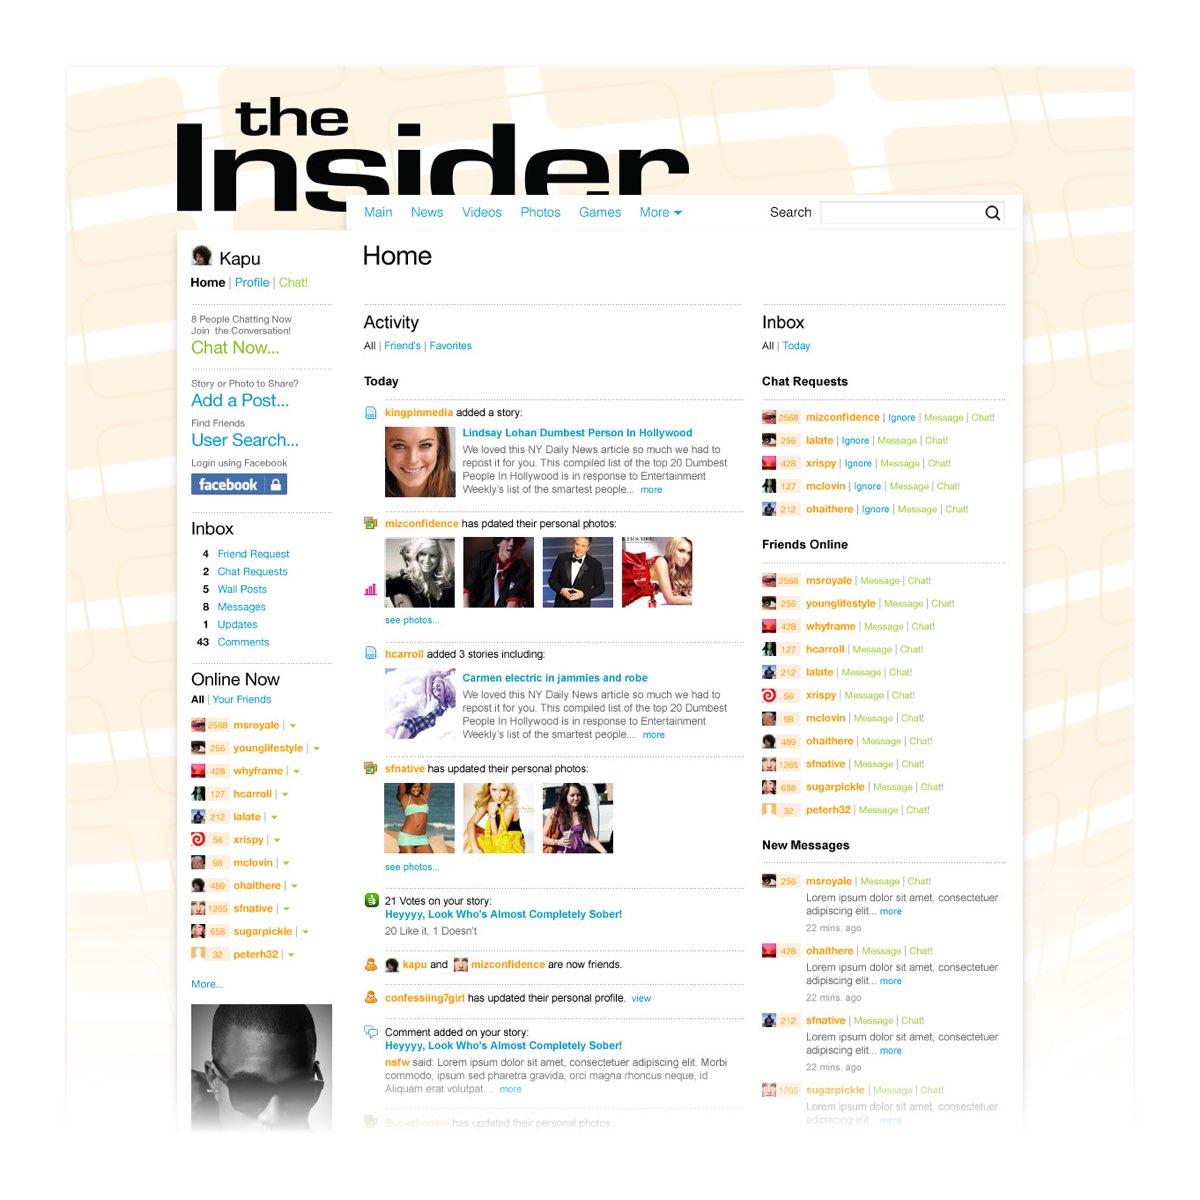 insider.014.jpeg